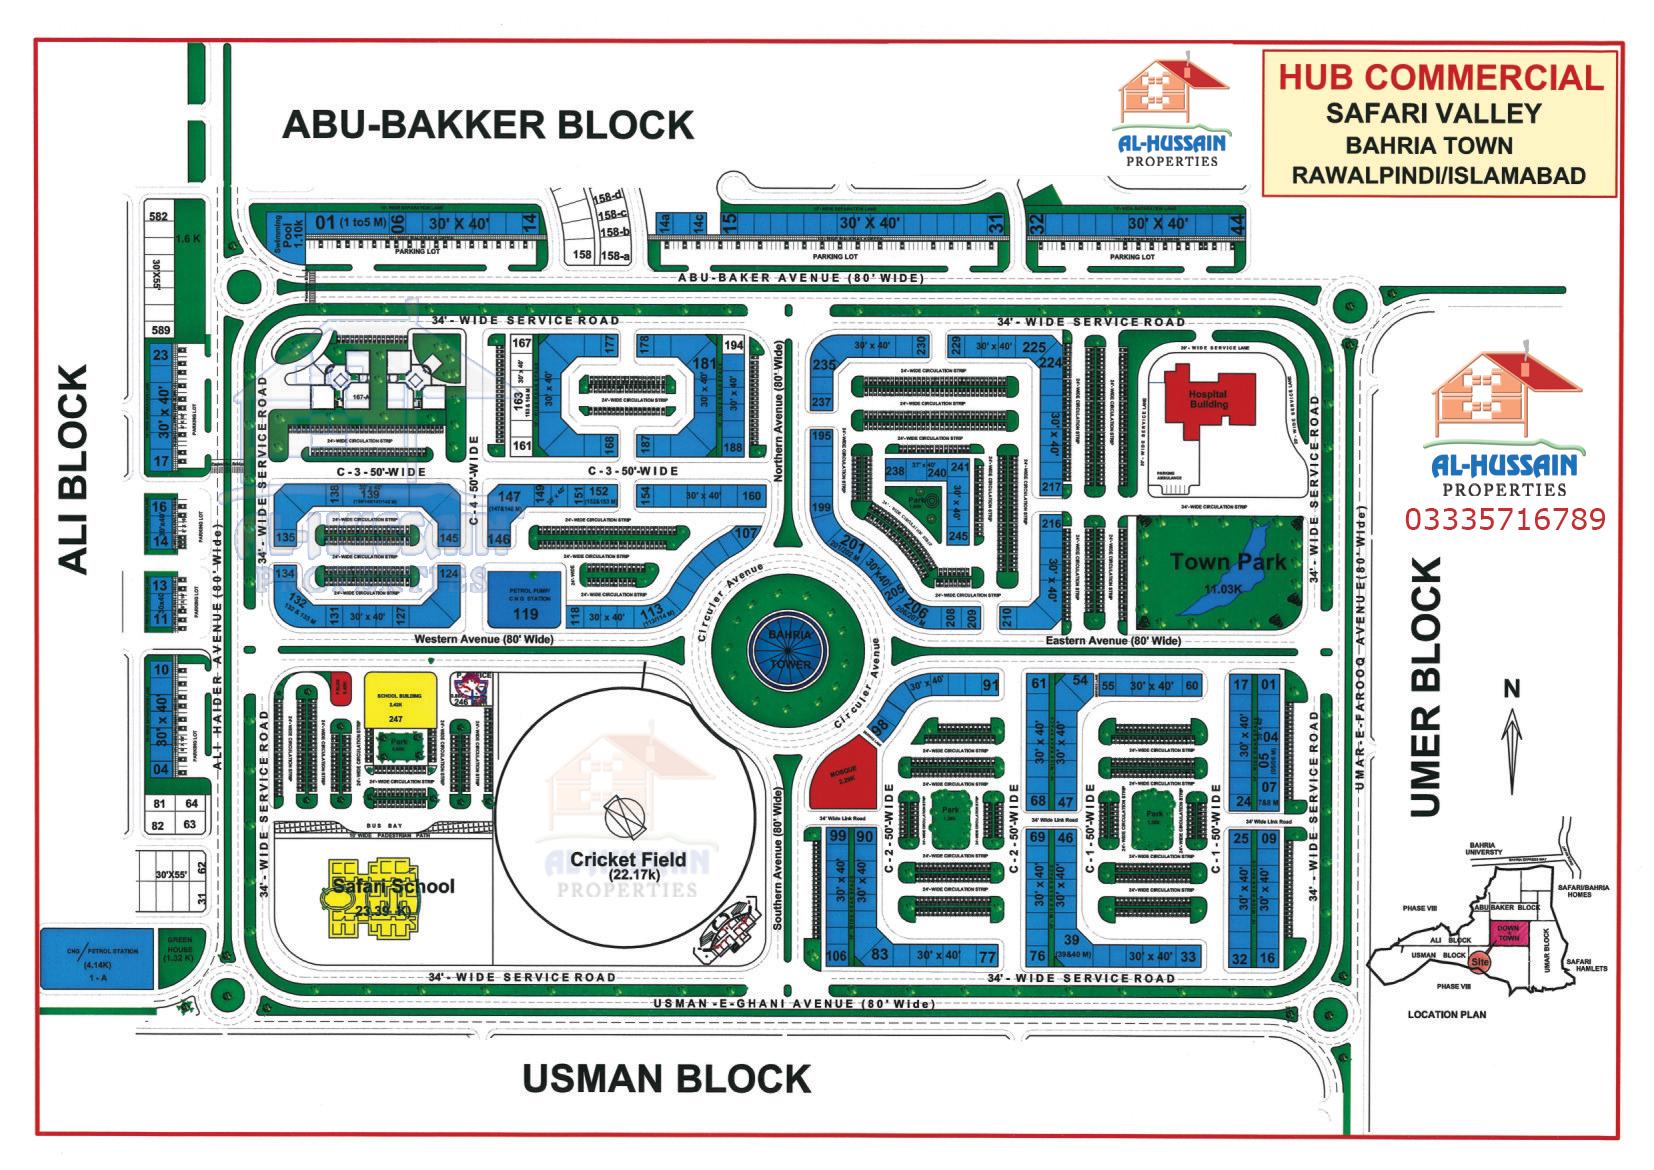 Hub Commercial Safari valley Bahria Town Rawalpindi/Islamabad